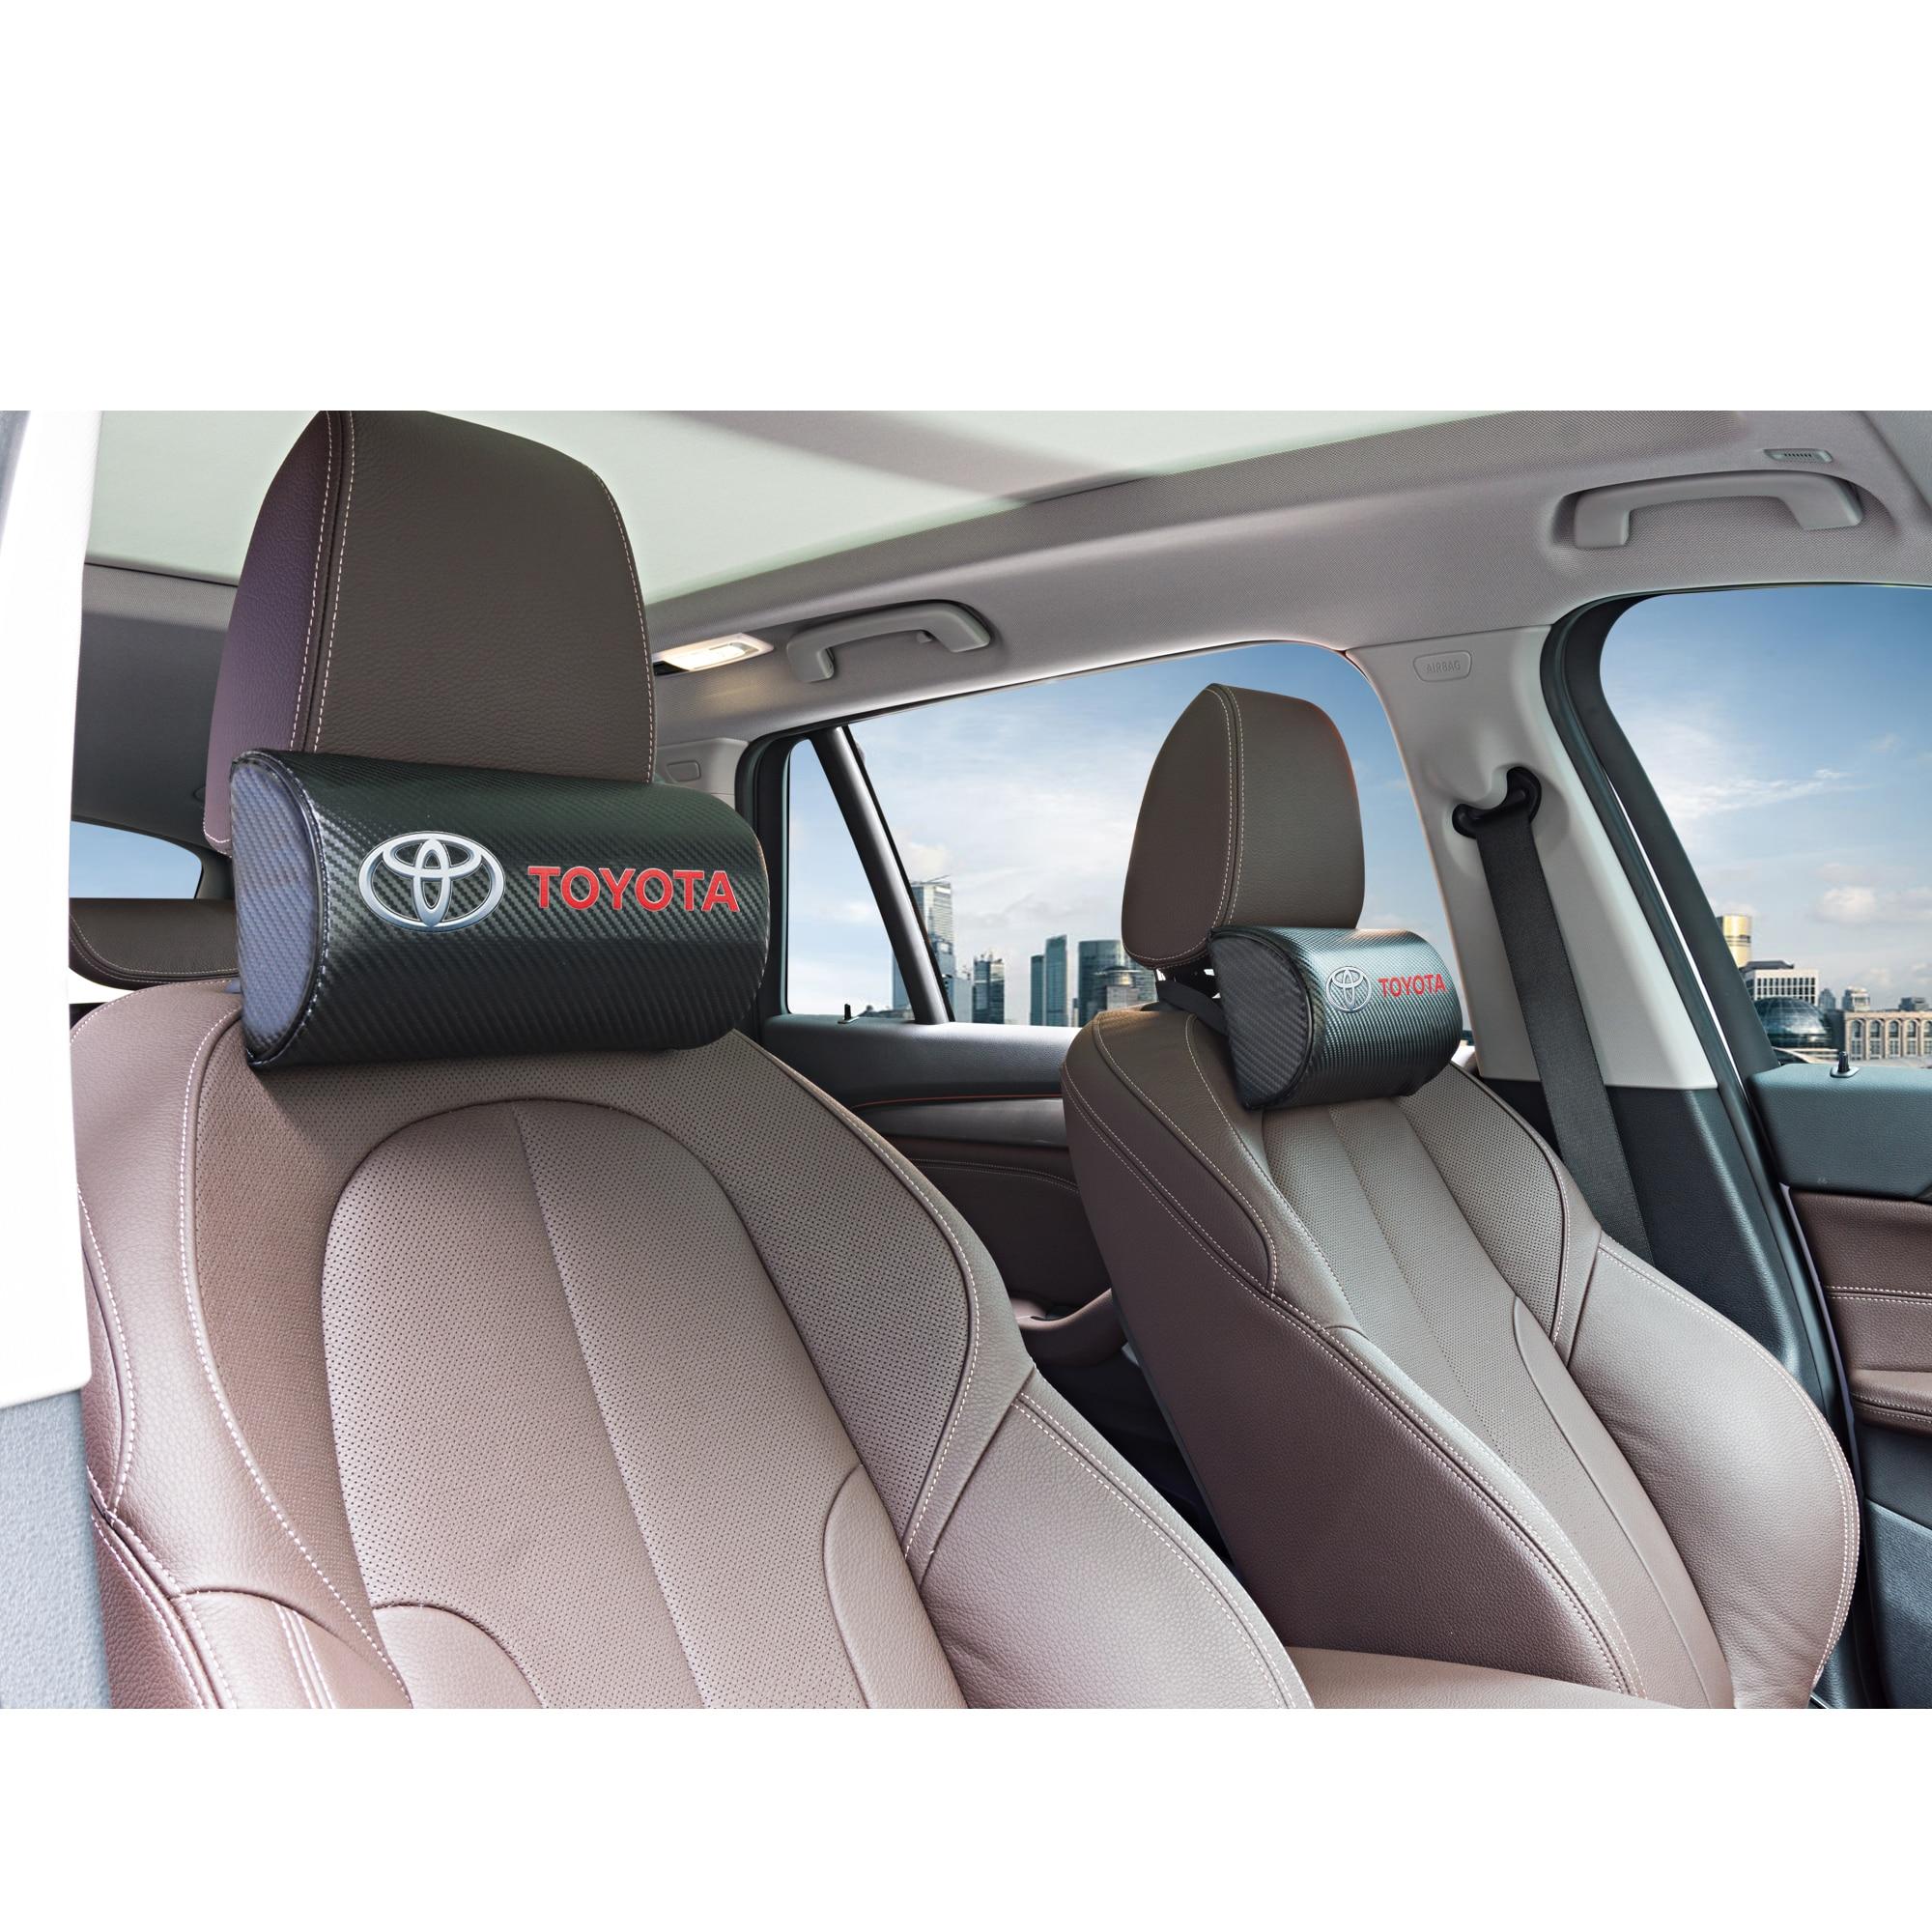 Car Neck Pillows For Toyota Camry Chr Corolla Rav4 Yaris Prius  Both Side Pu Leather Single Headrest